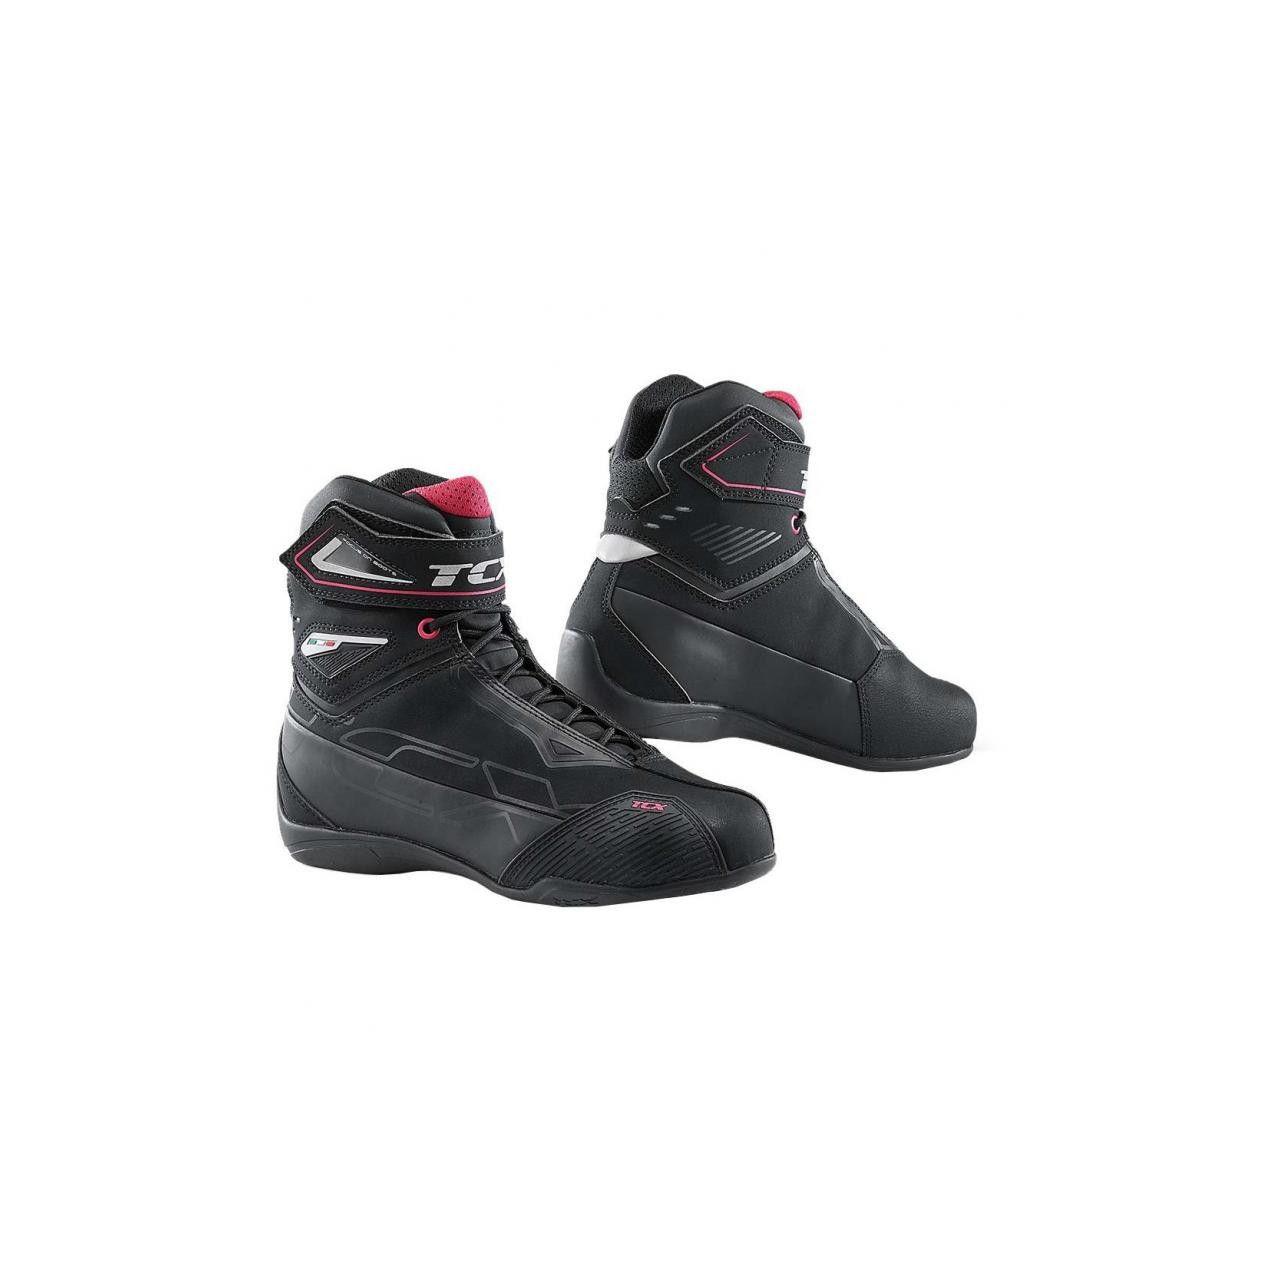 TCX Chaussures femme Rush 2 Lady Waterproof